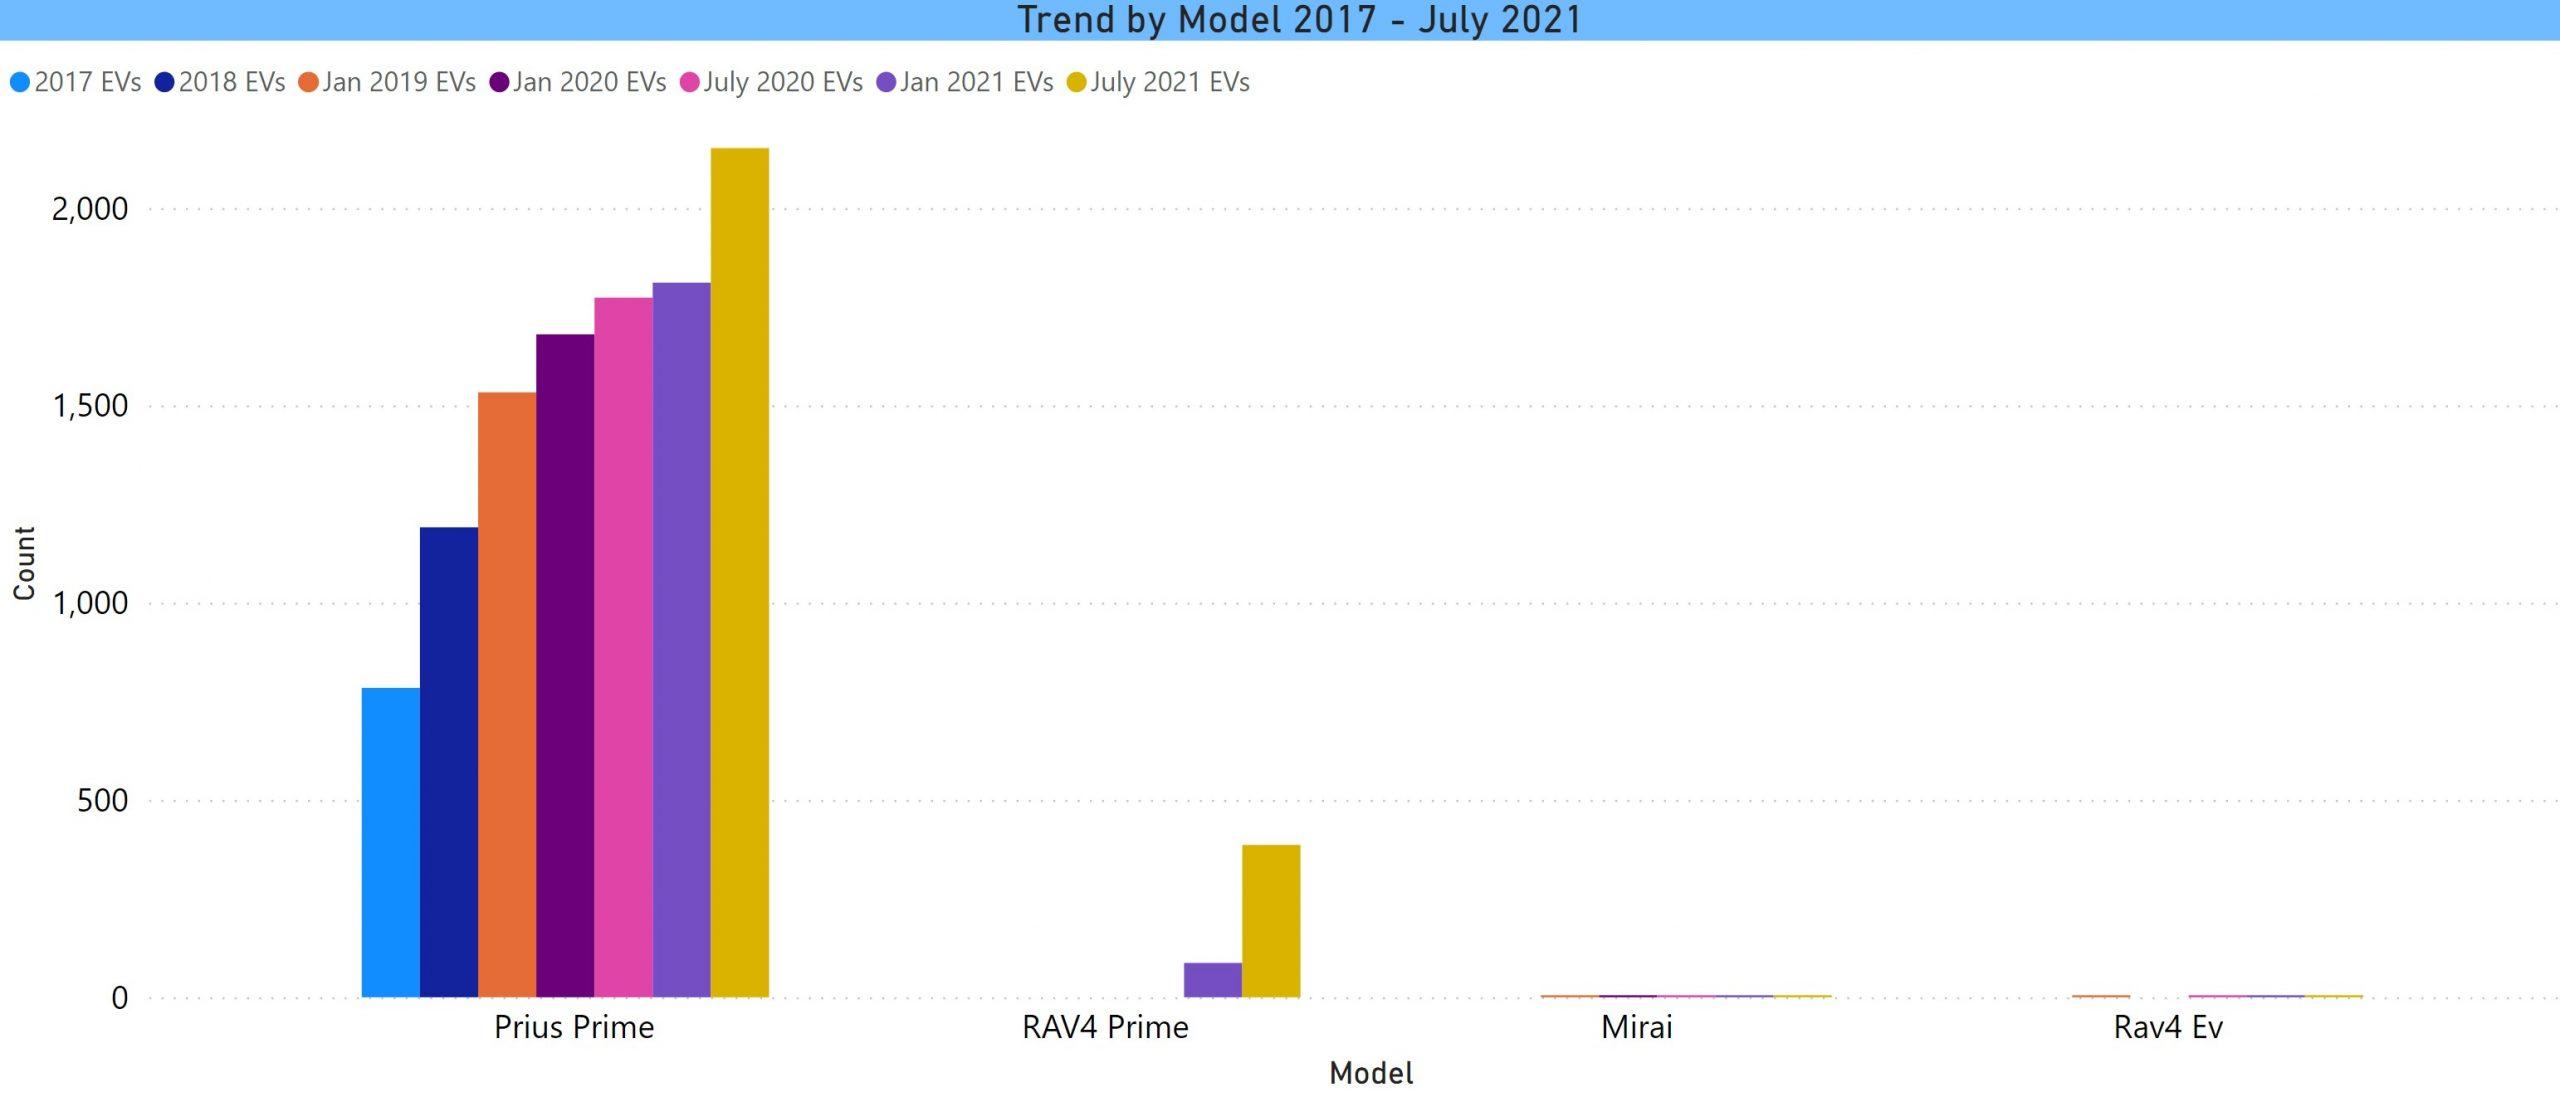 Toyota model trend